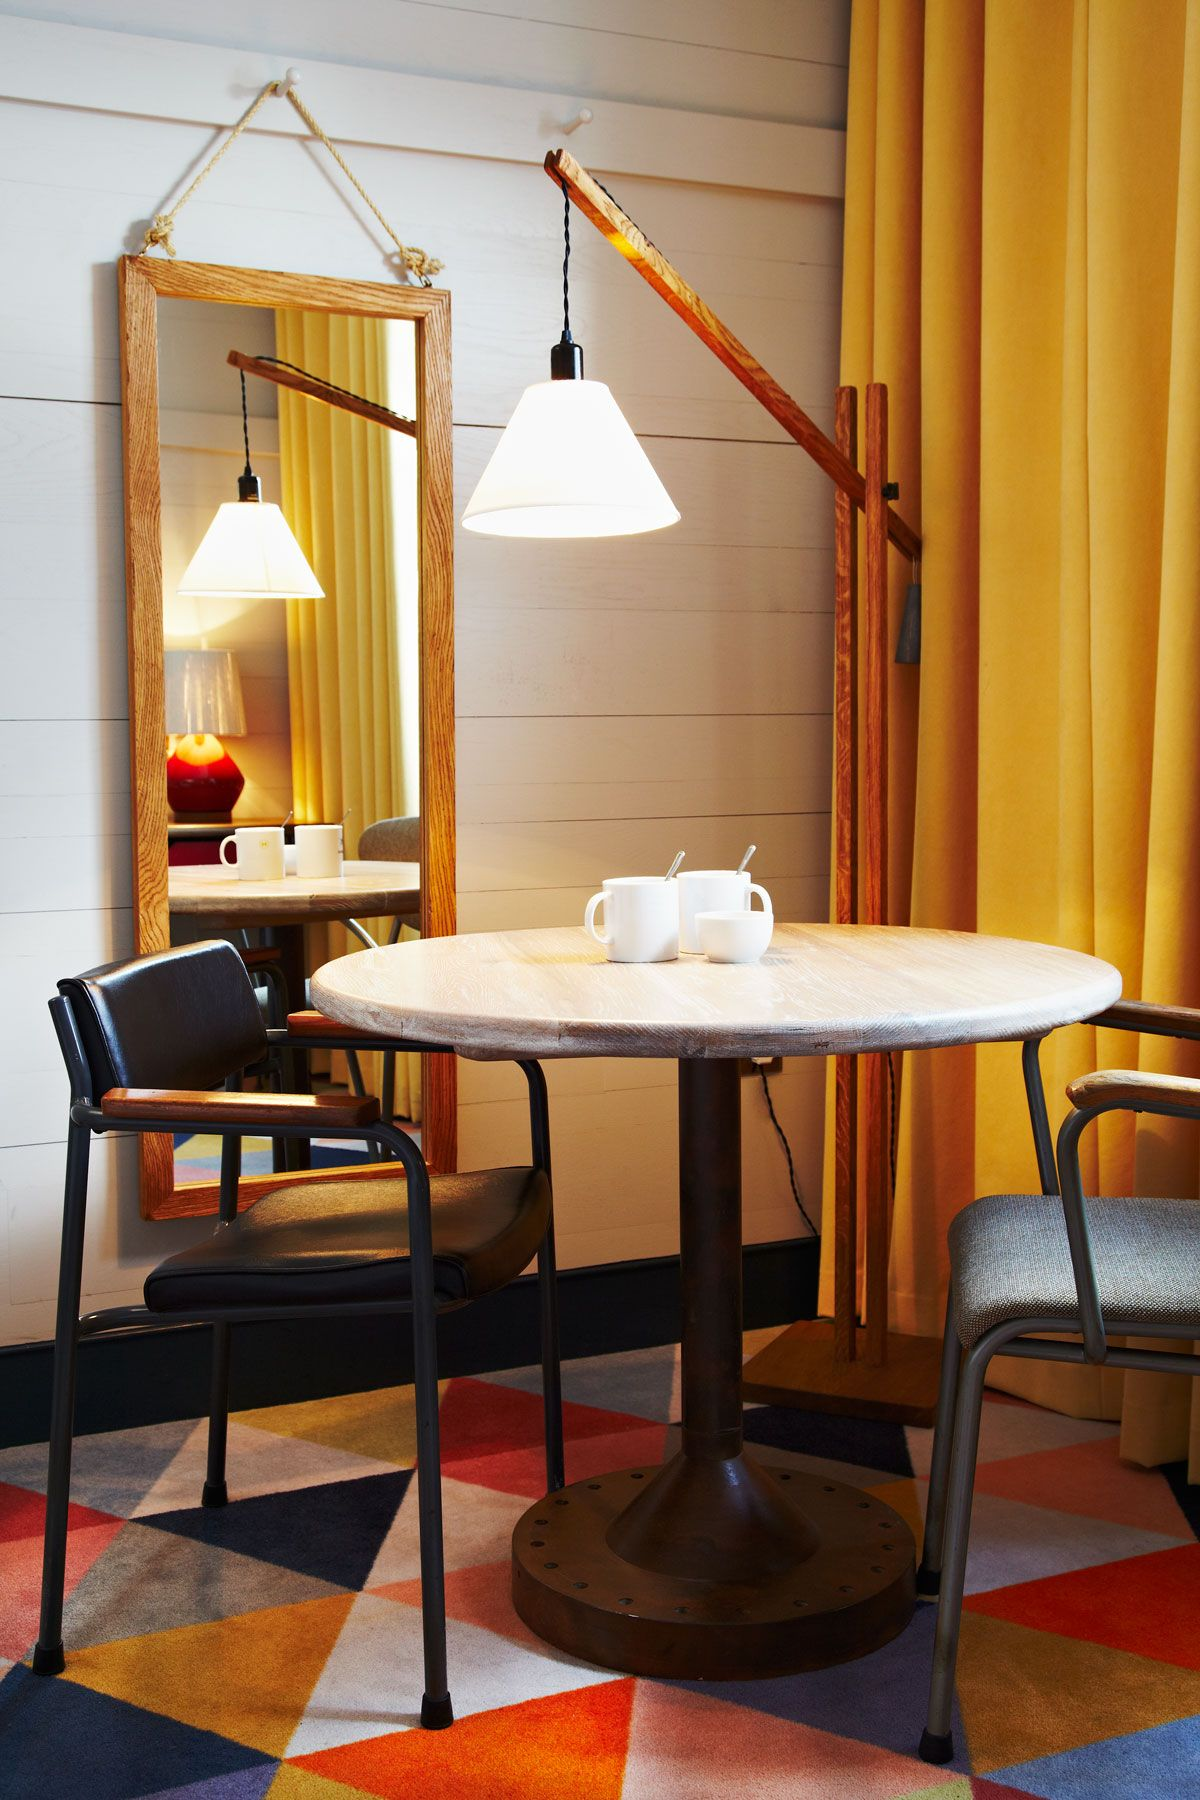 Shoreditch Design Rooms: The Hoxton Shoreditch